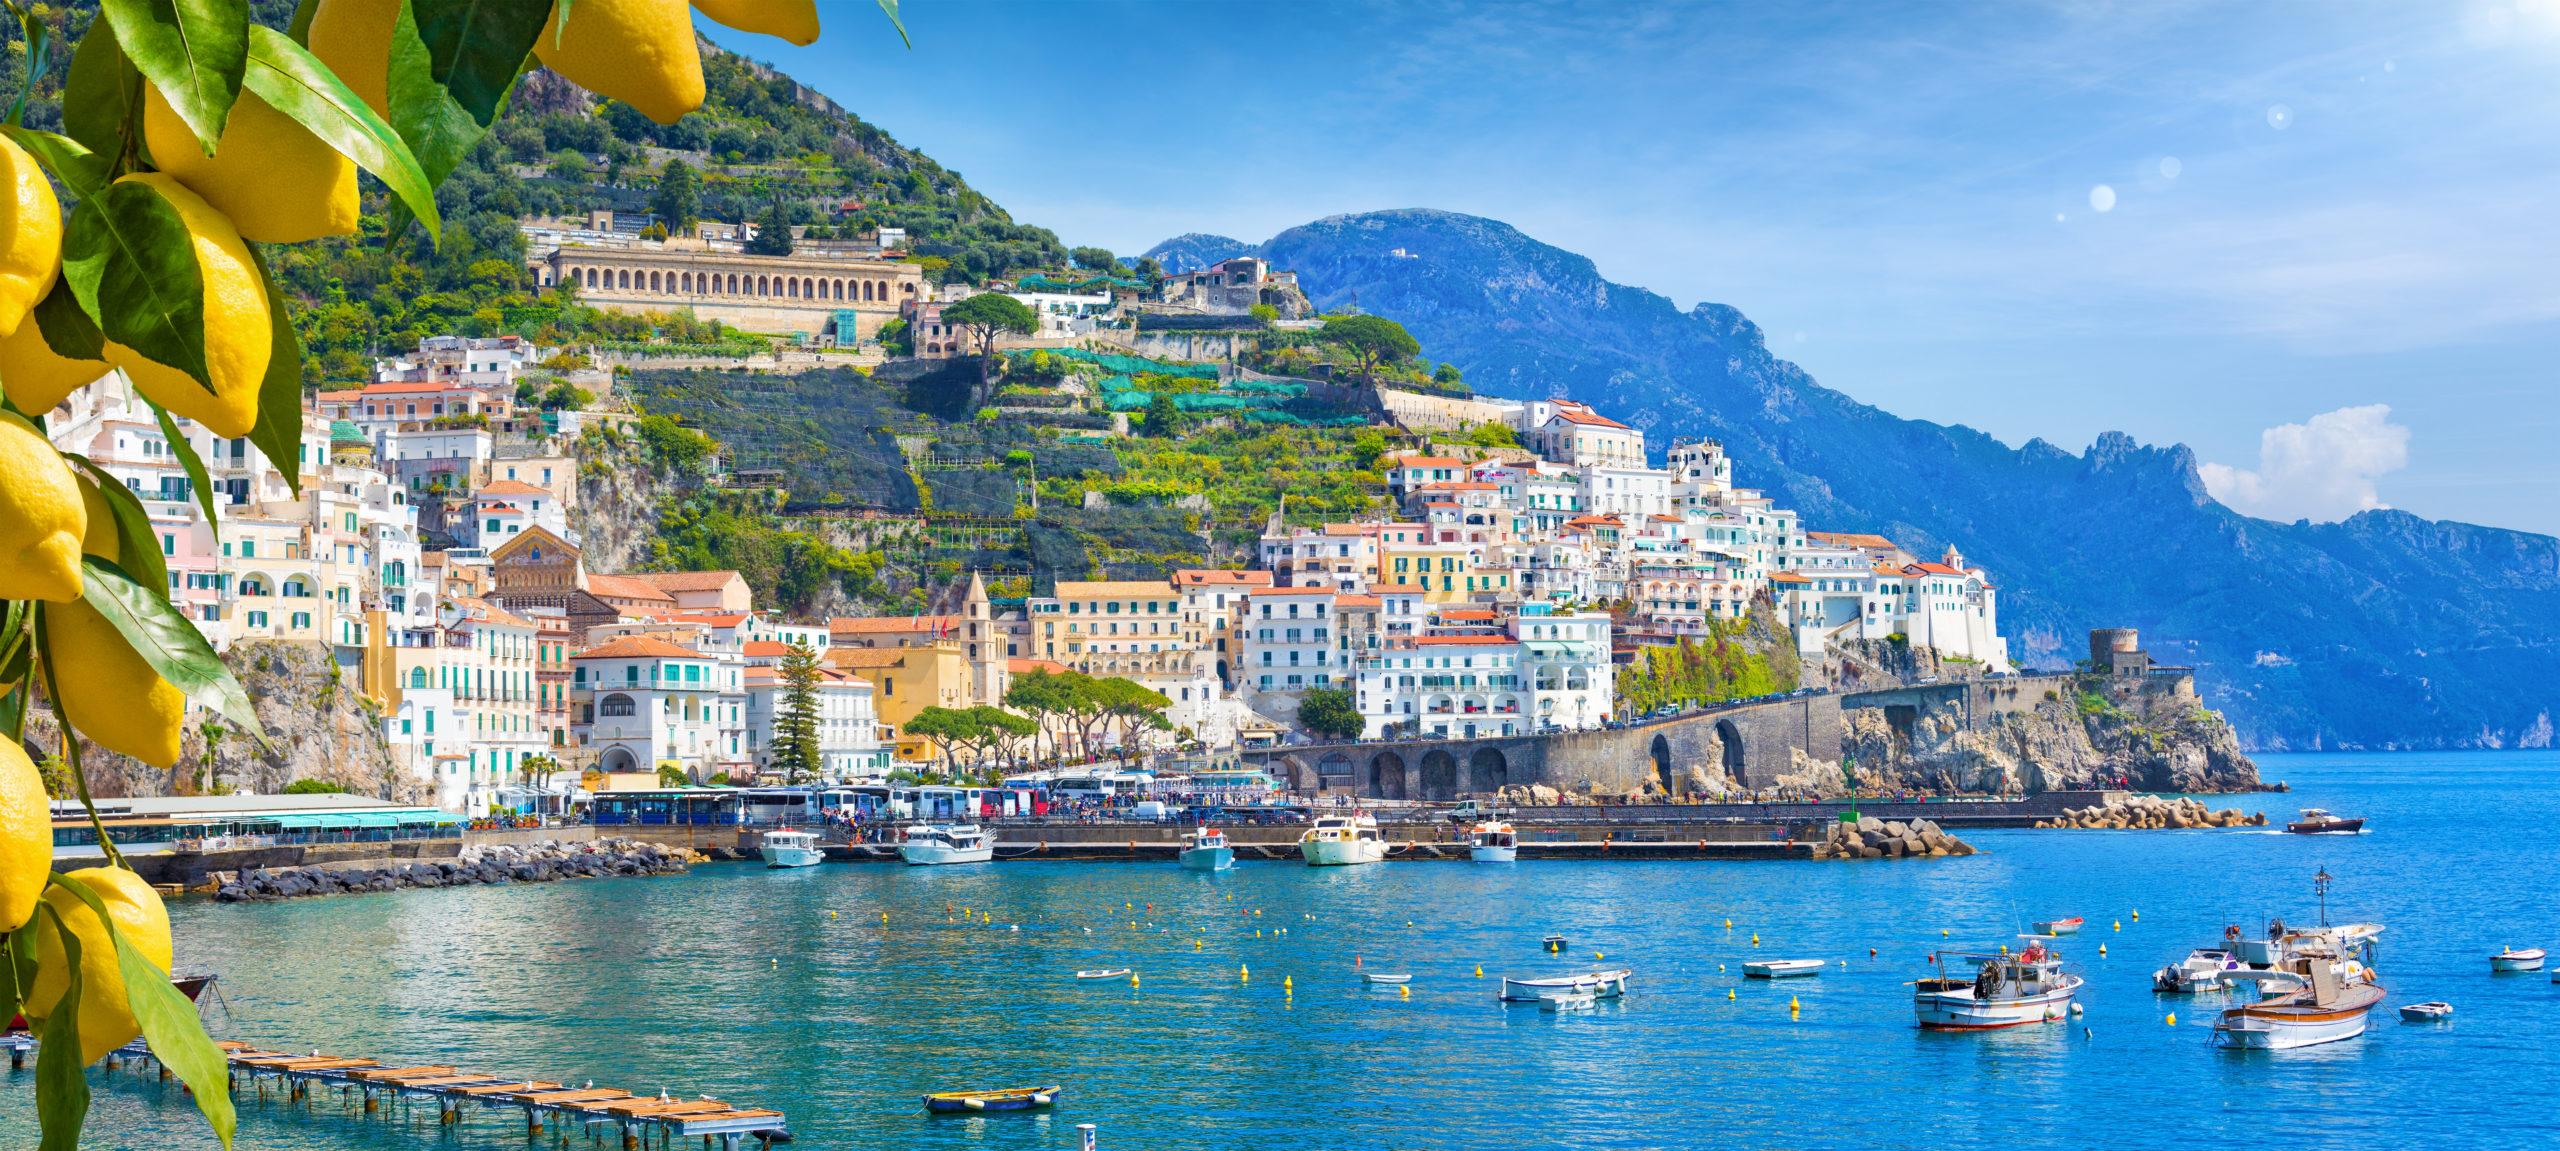 The Bay of Naples & Amalfi Coast